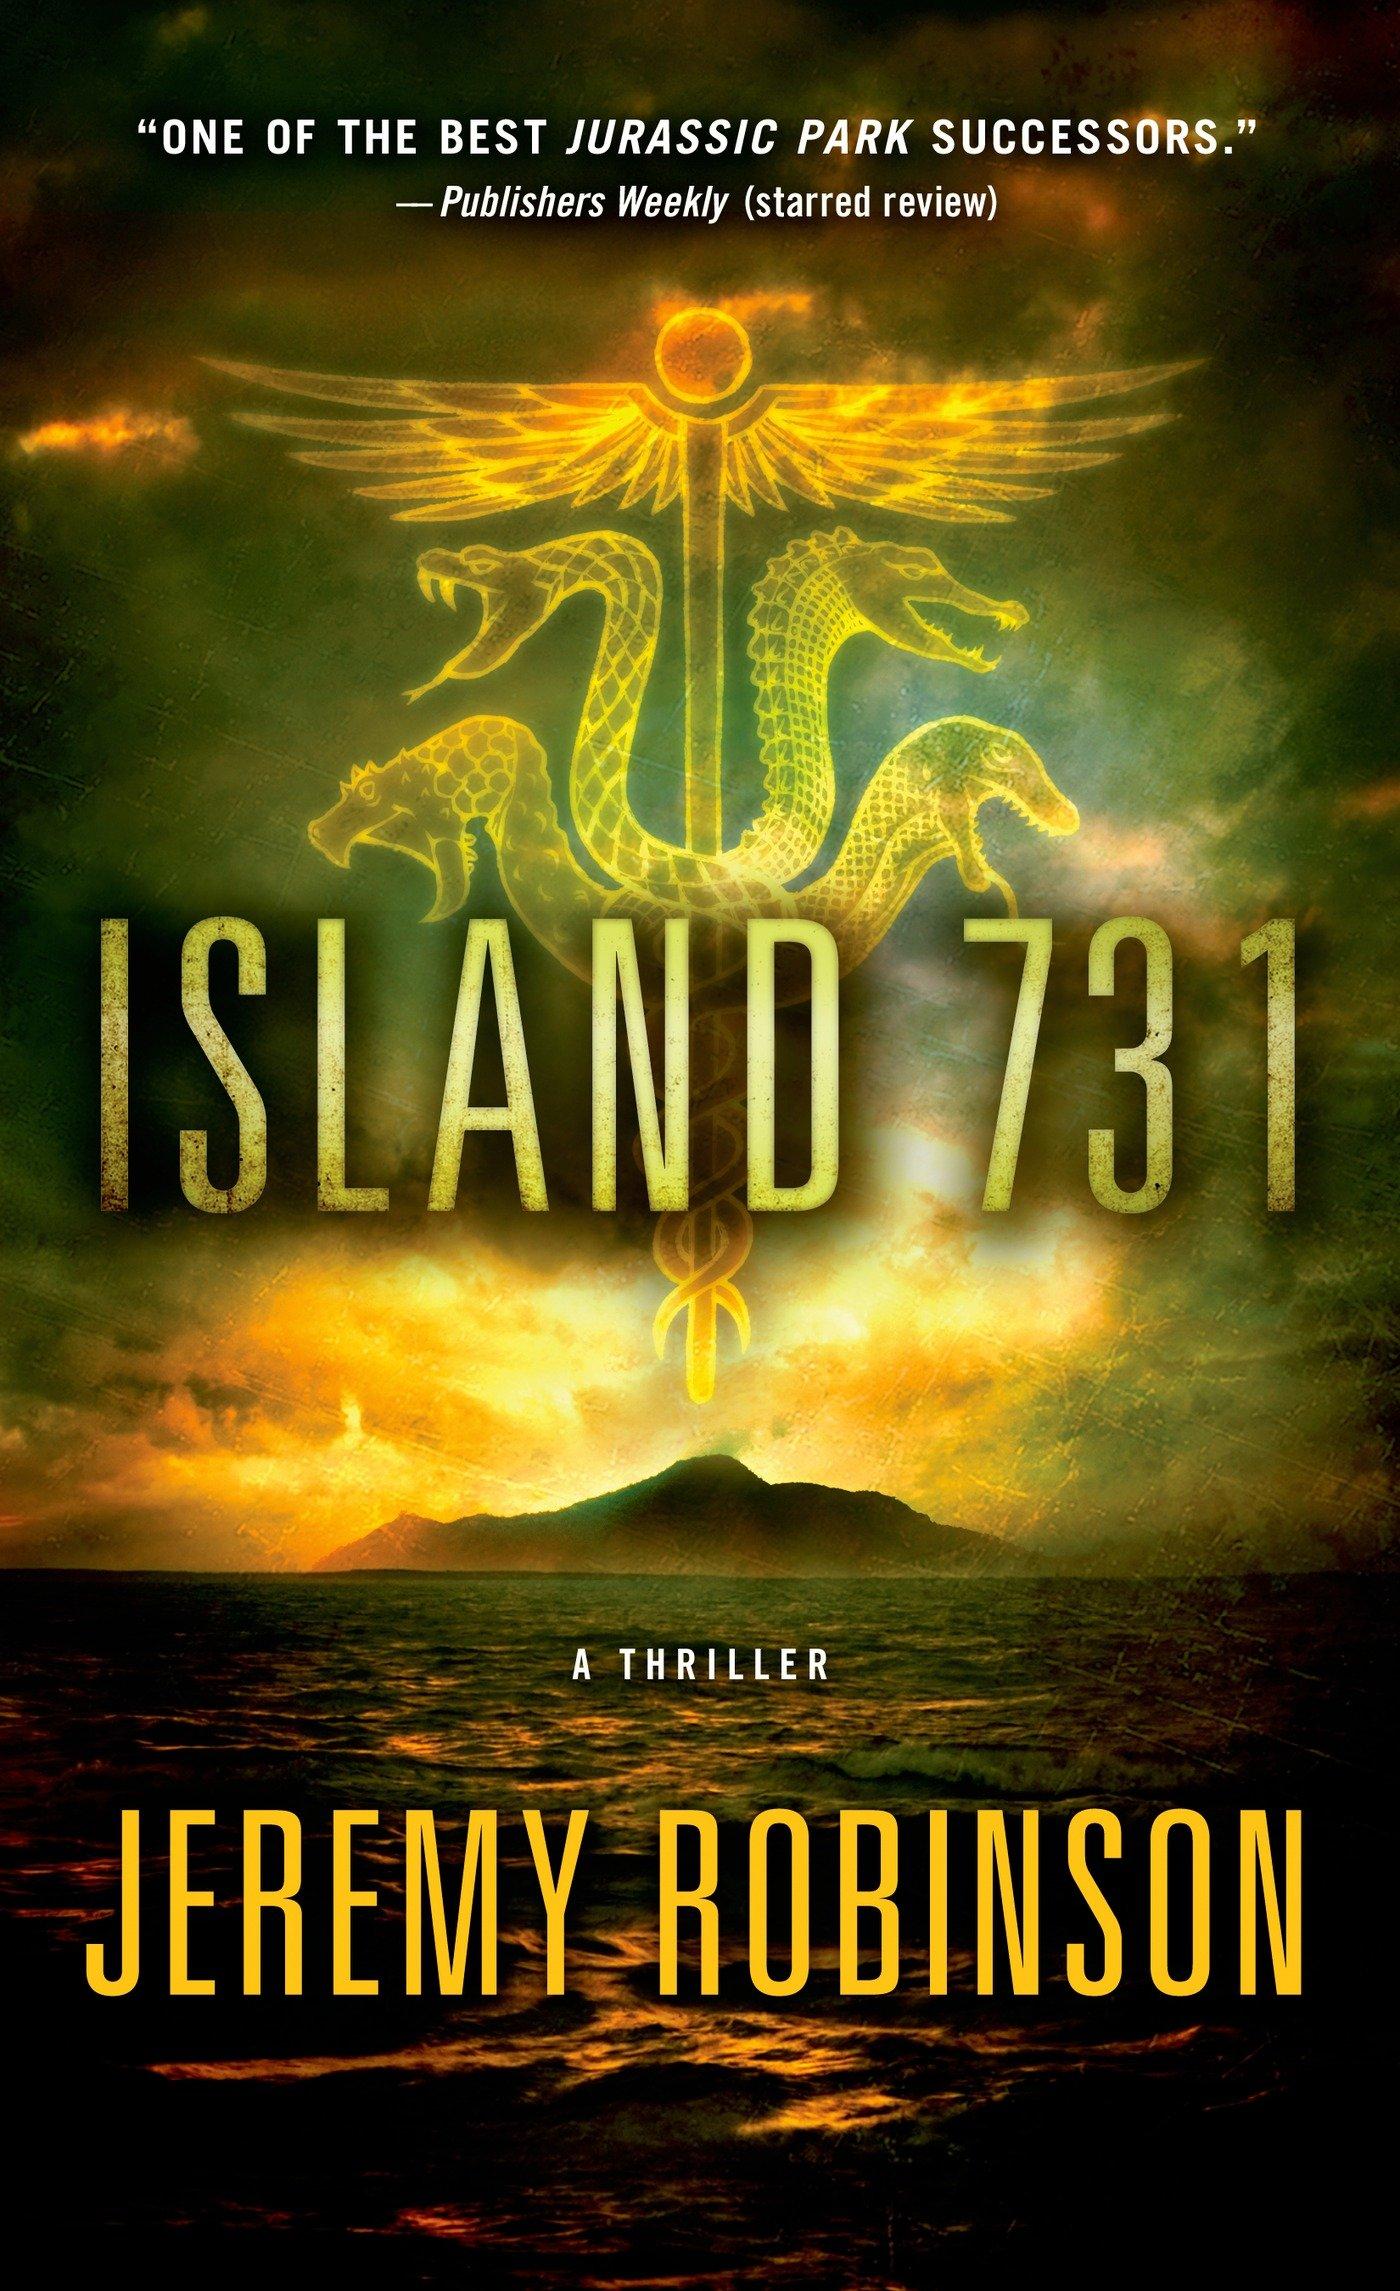 Island 731 Jeremy Robinson